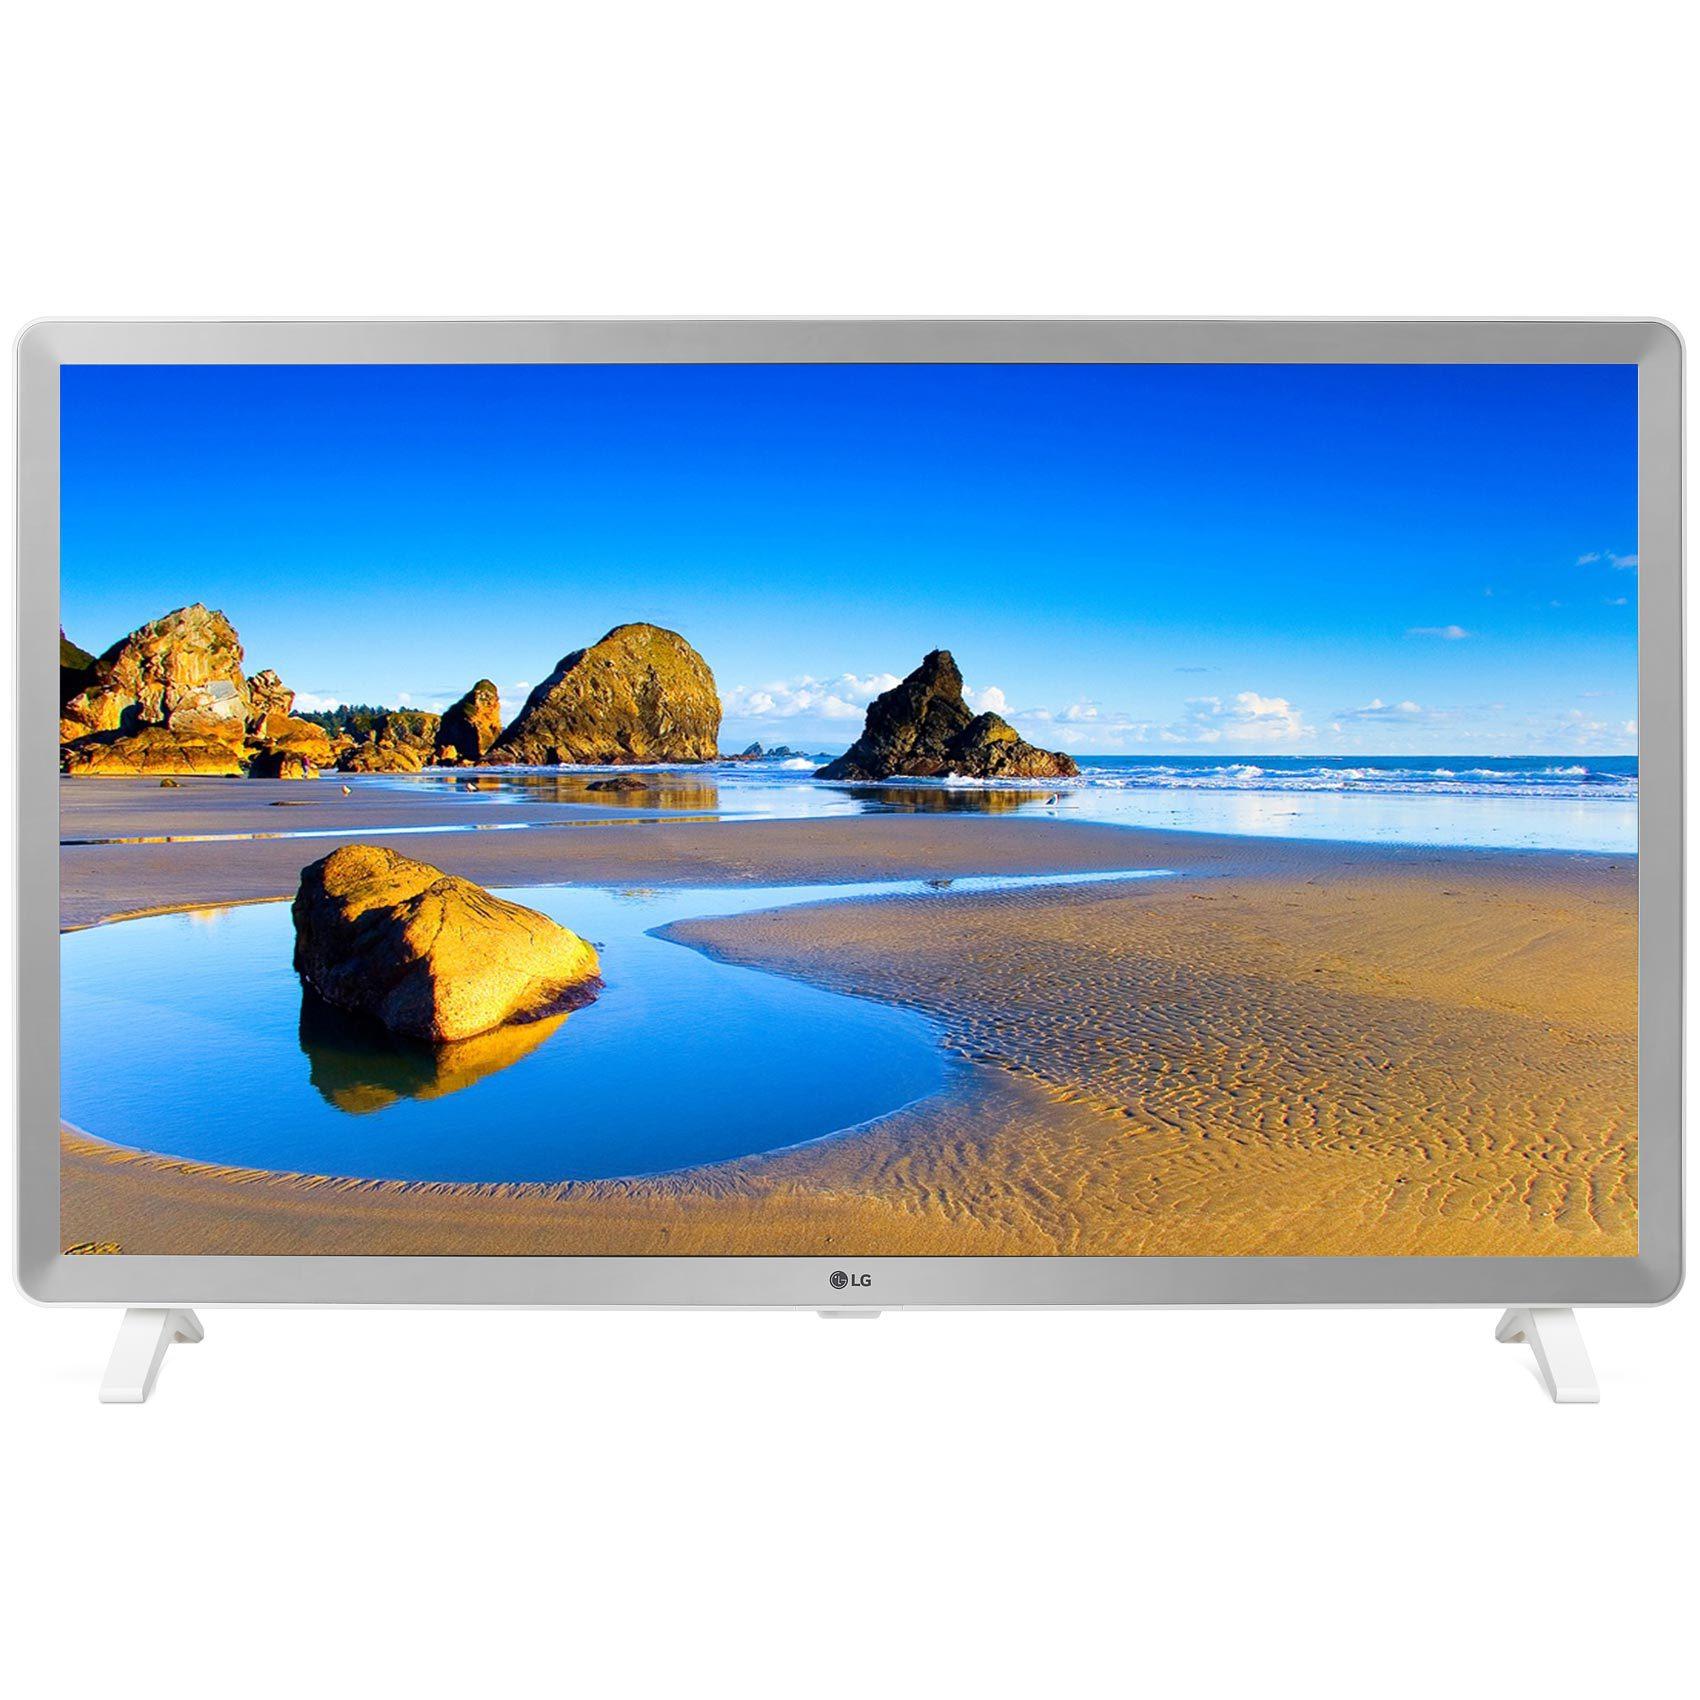 LG 32 inch Smart TV 32LK610D